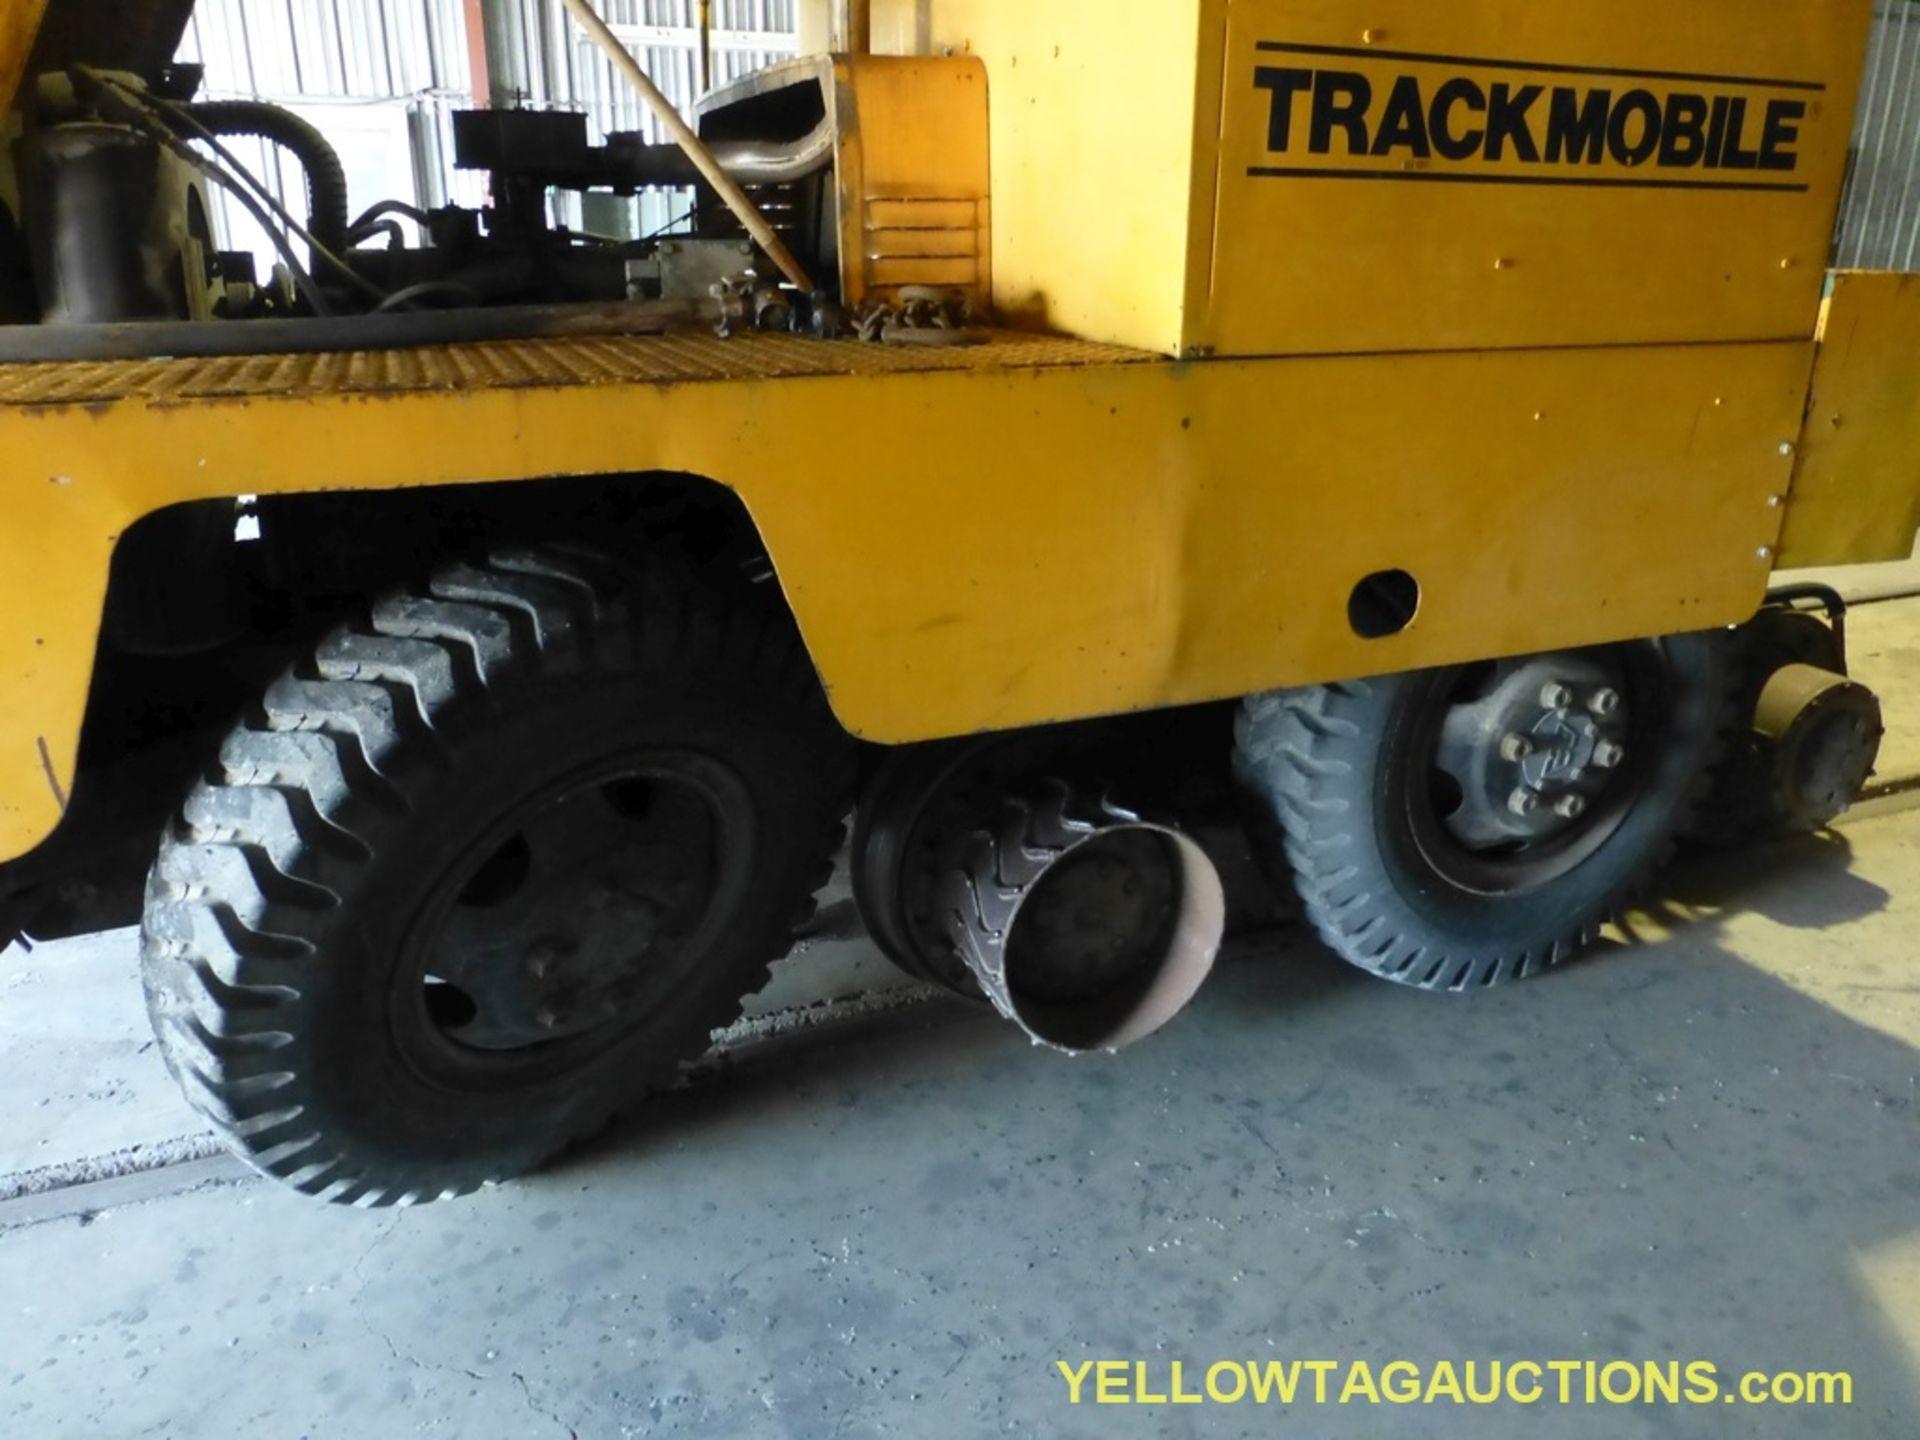 Lot 4429 - Track Mobile Rail Car Mover | Model No. 7TM; Bad Tie Rod